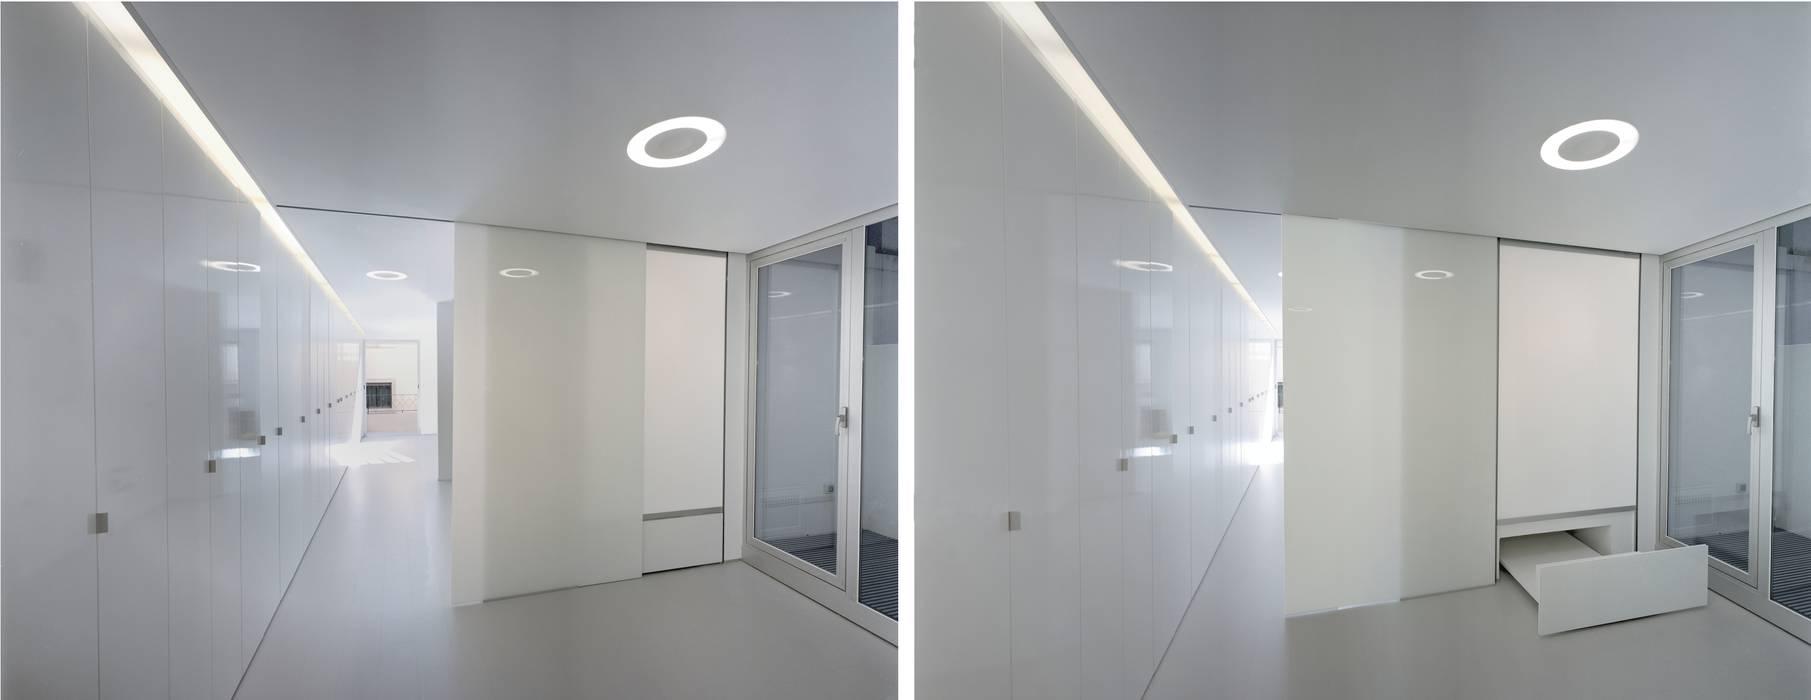 dooa arquitecturas Study/office